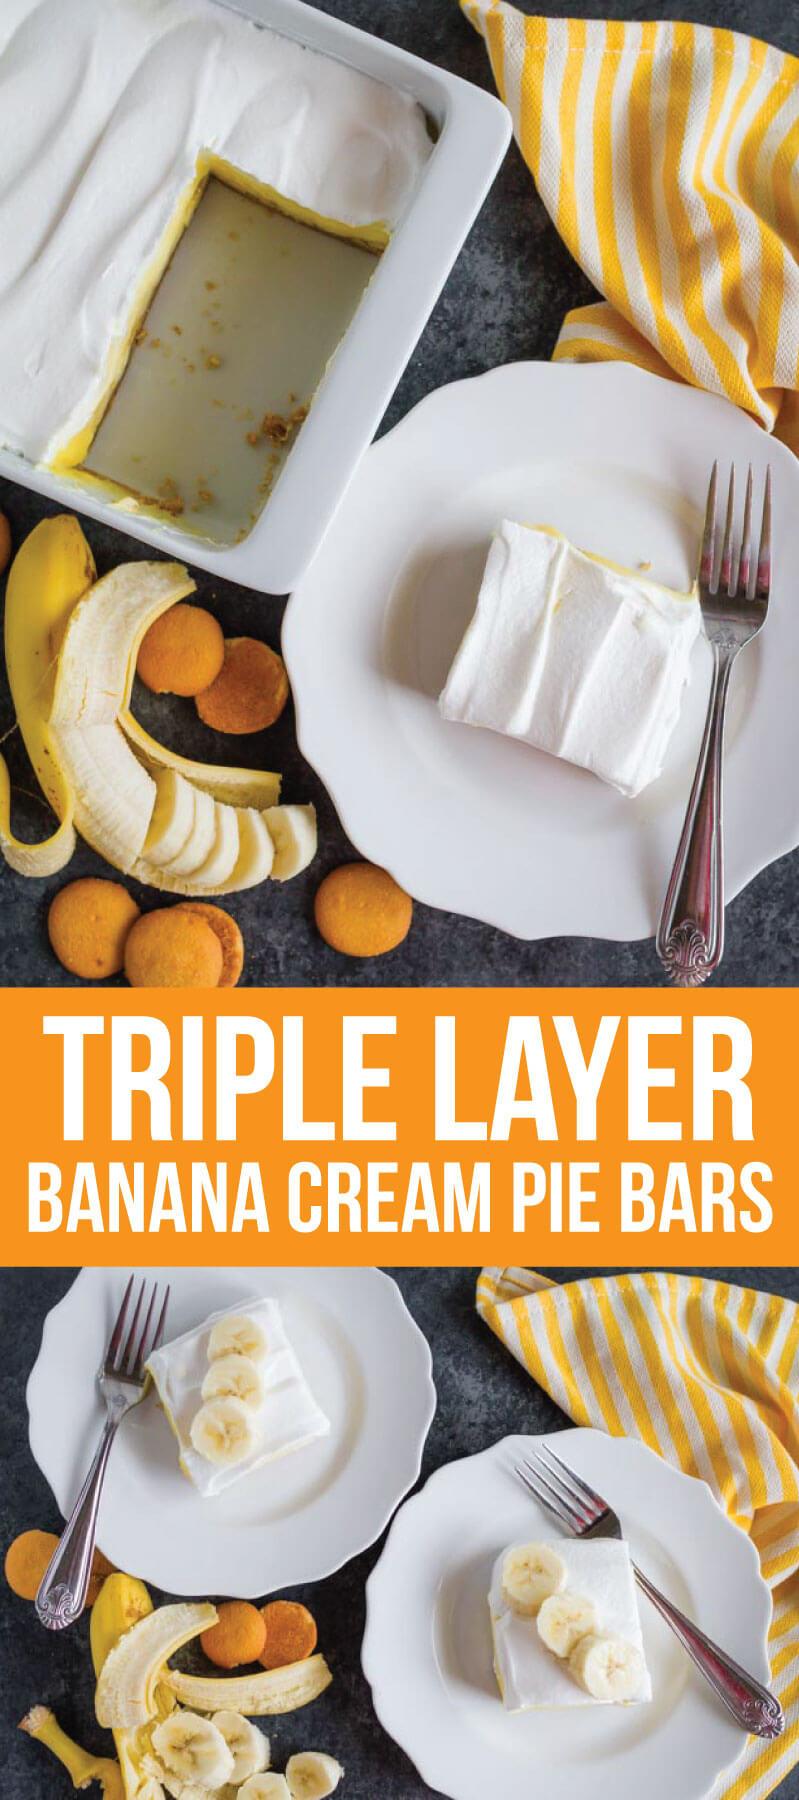 The most delicious Triple Layer Banana Cream Pie Bars - a good, easy dessert recipe via www.thirtyhandmadedays.com